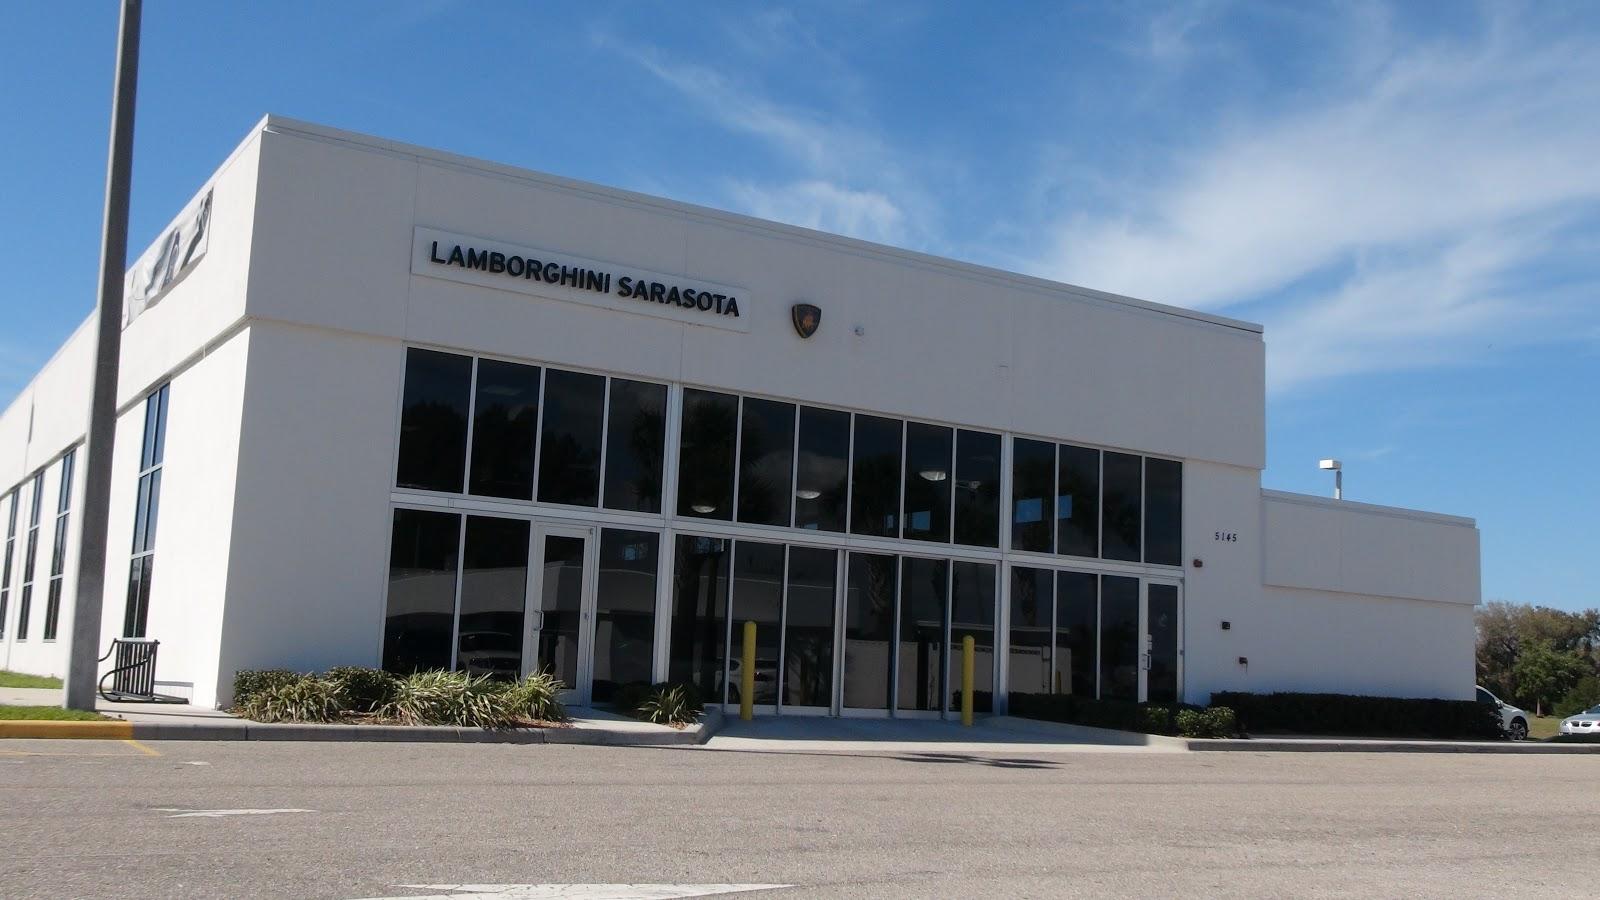 Lamborghini Tampa Where Is The Nearest Lamborghini Dealership To